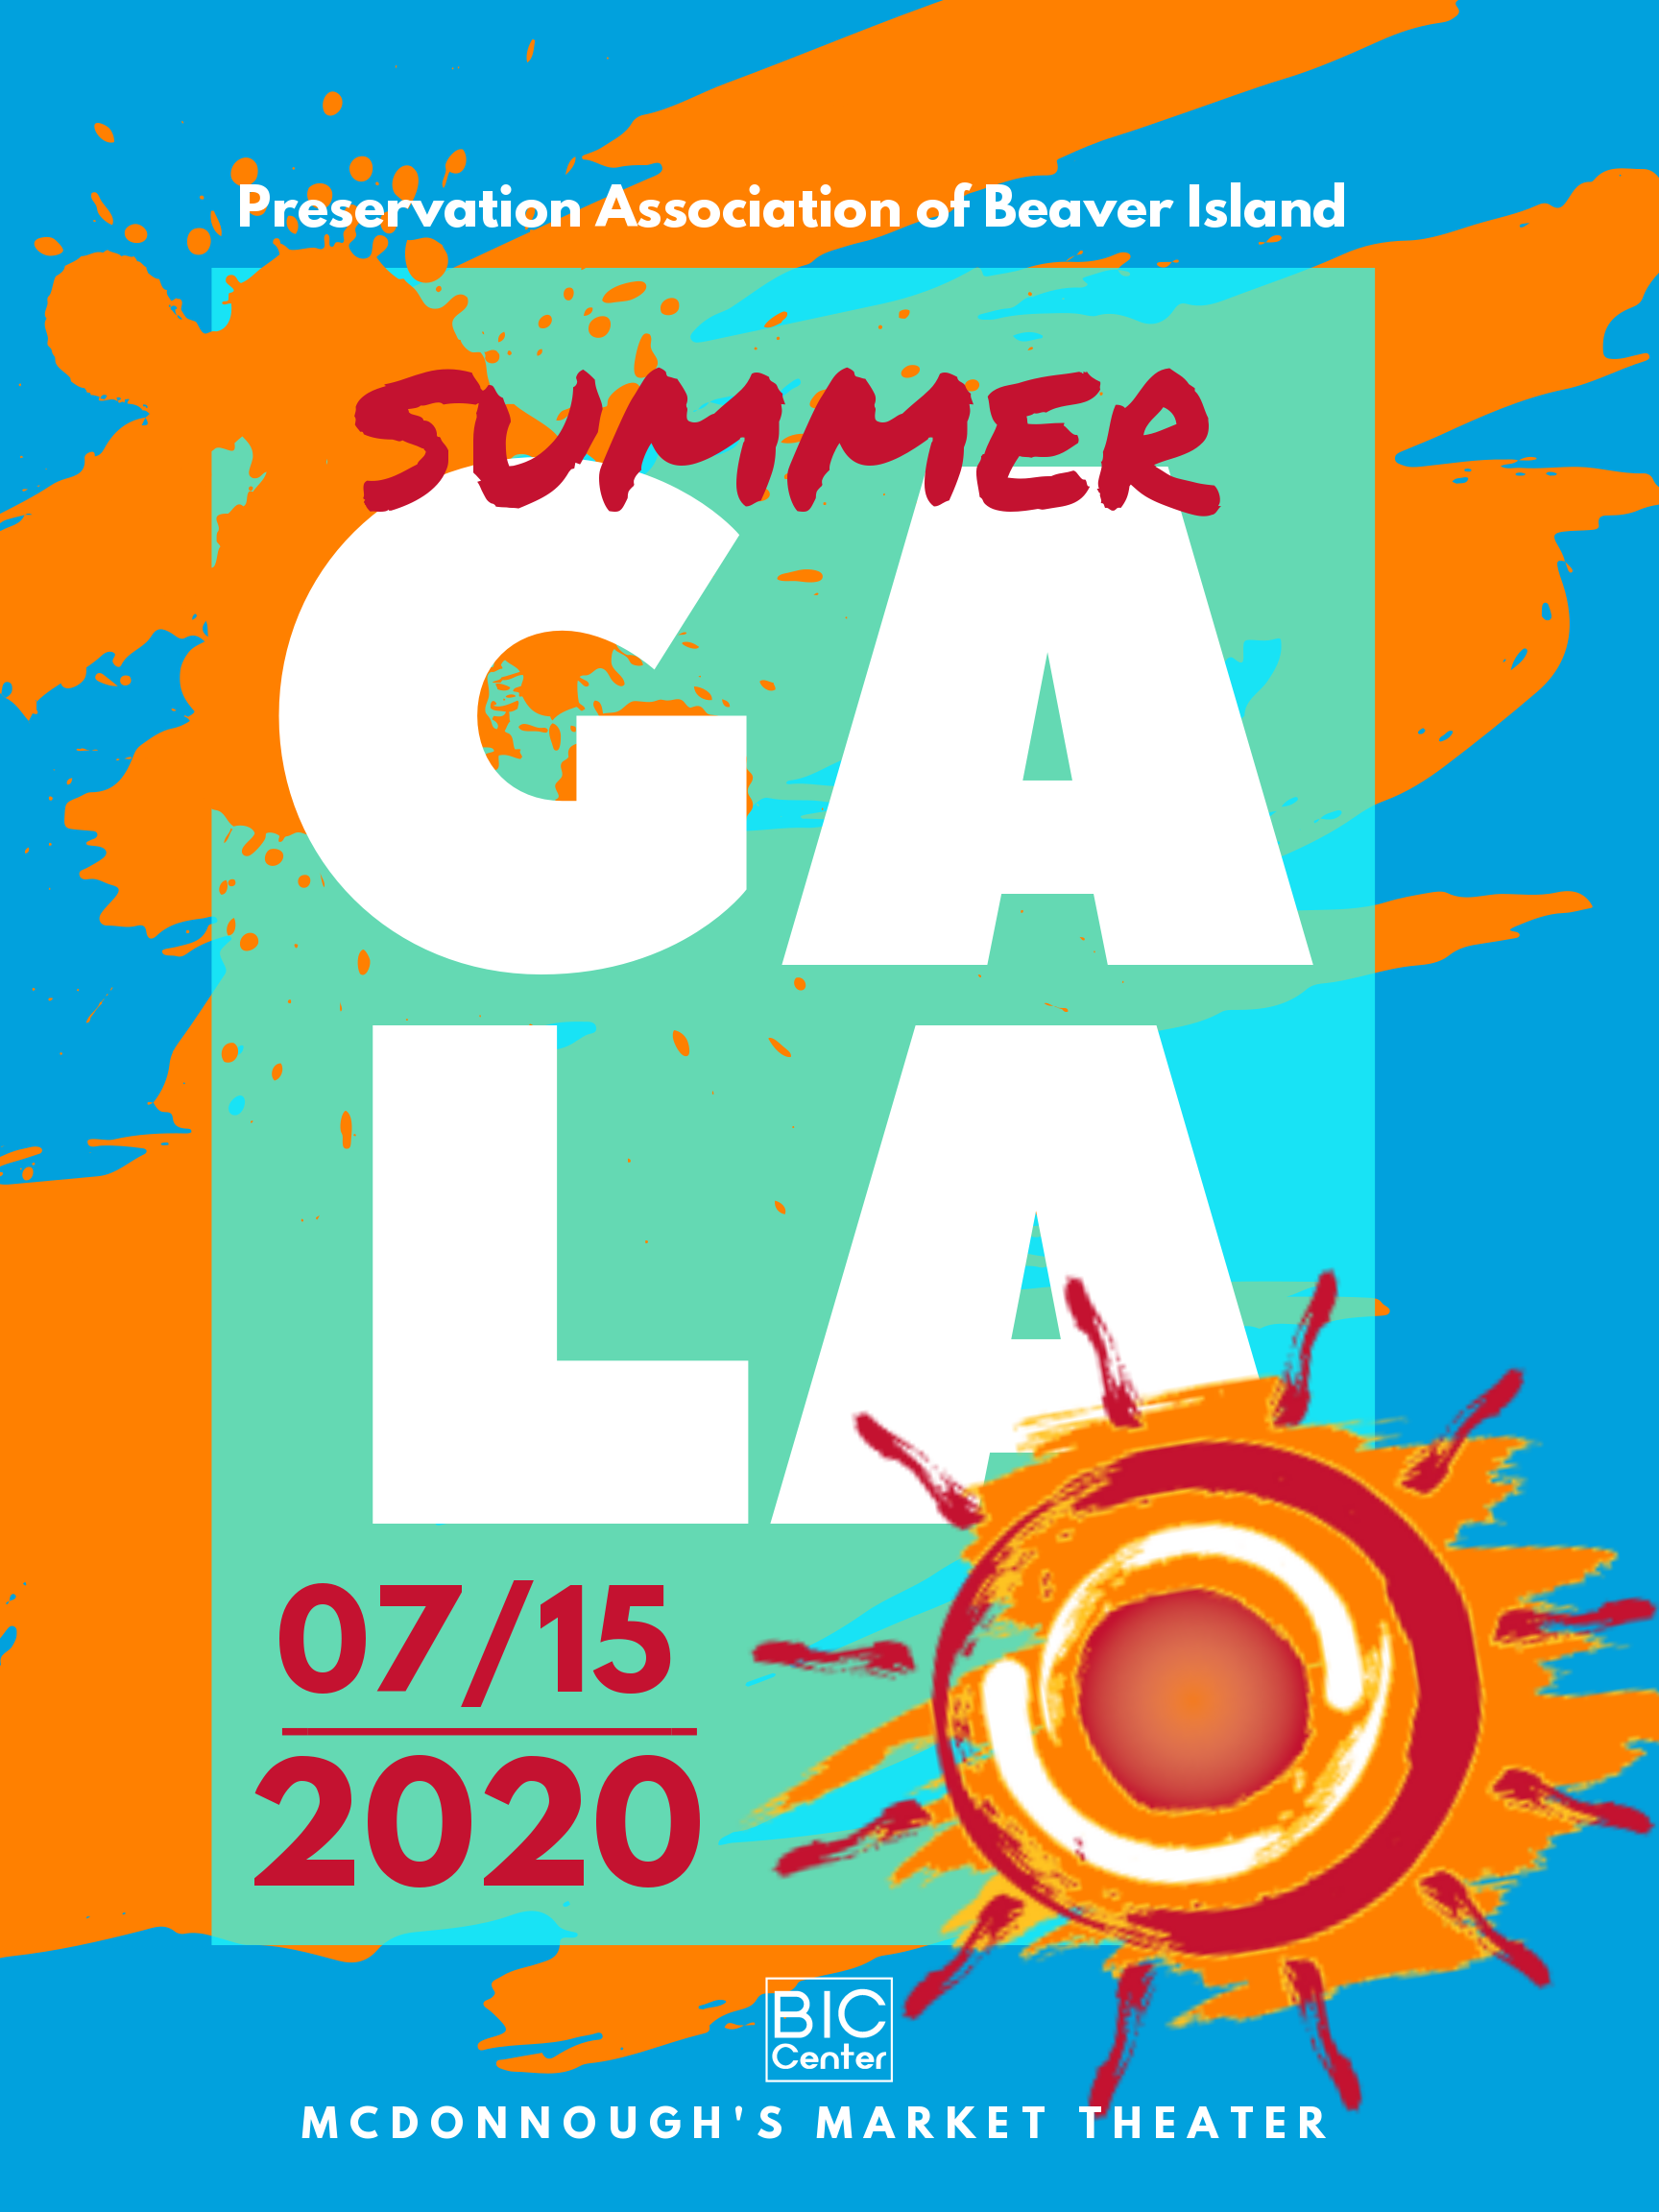 PABI Summer GALA @ Beaver Island Community Center